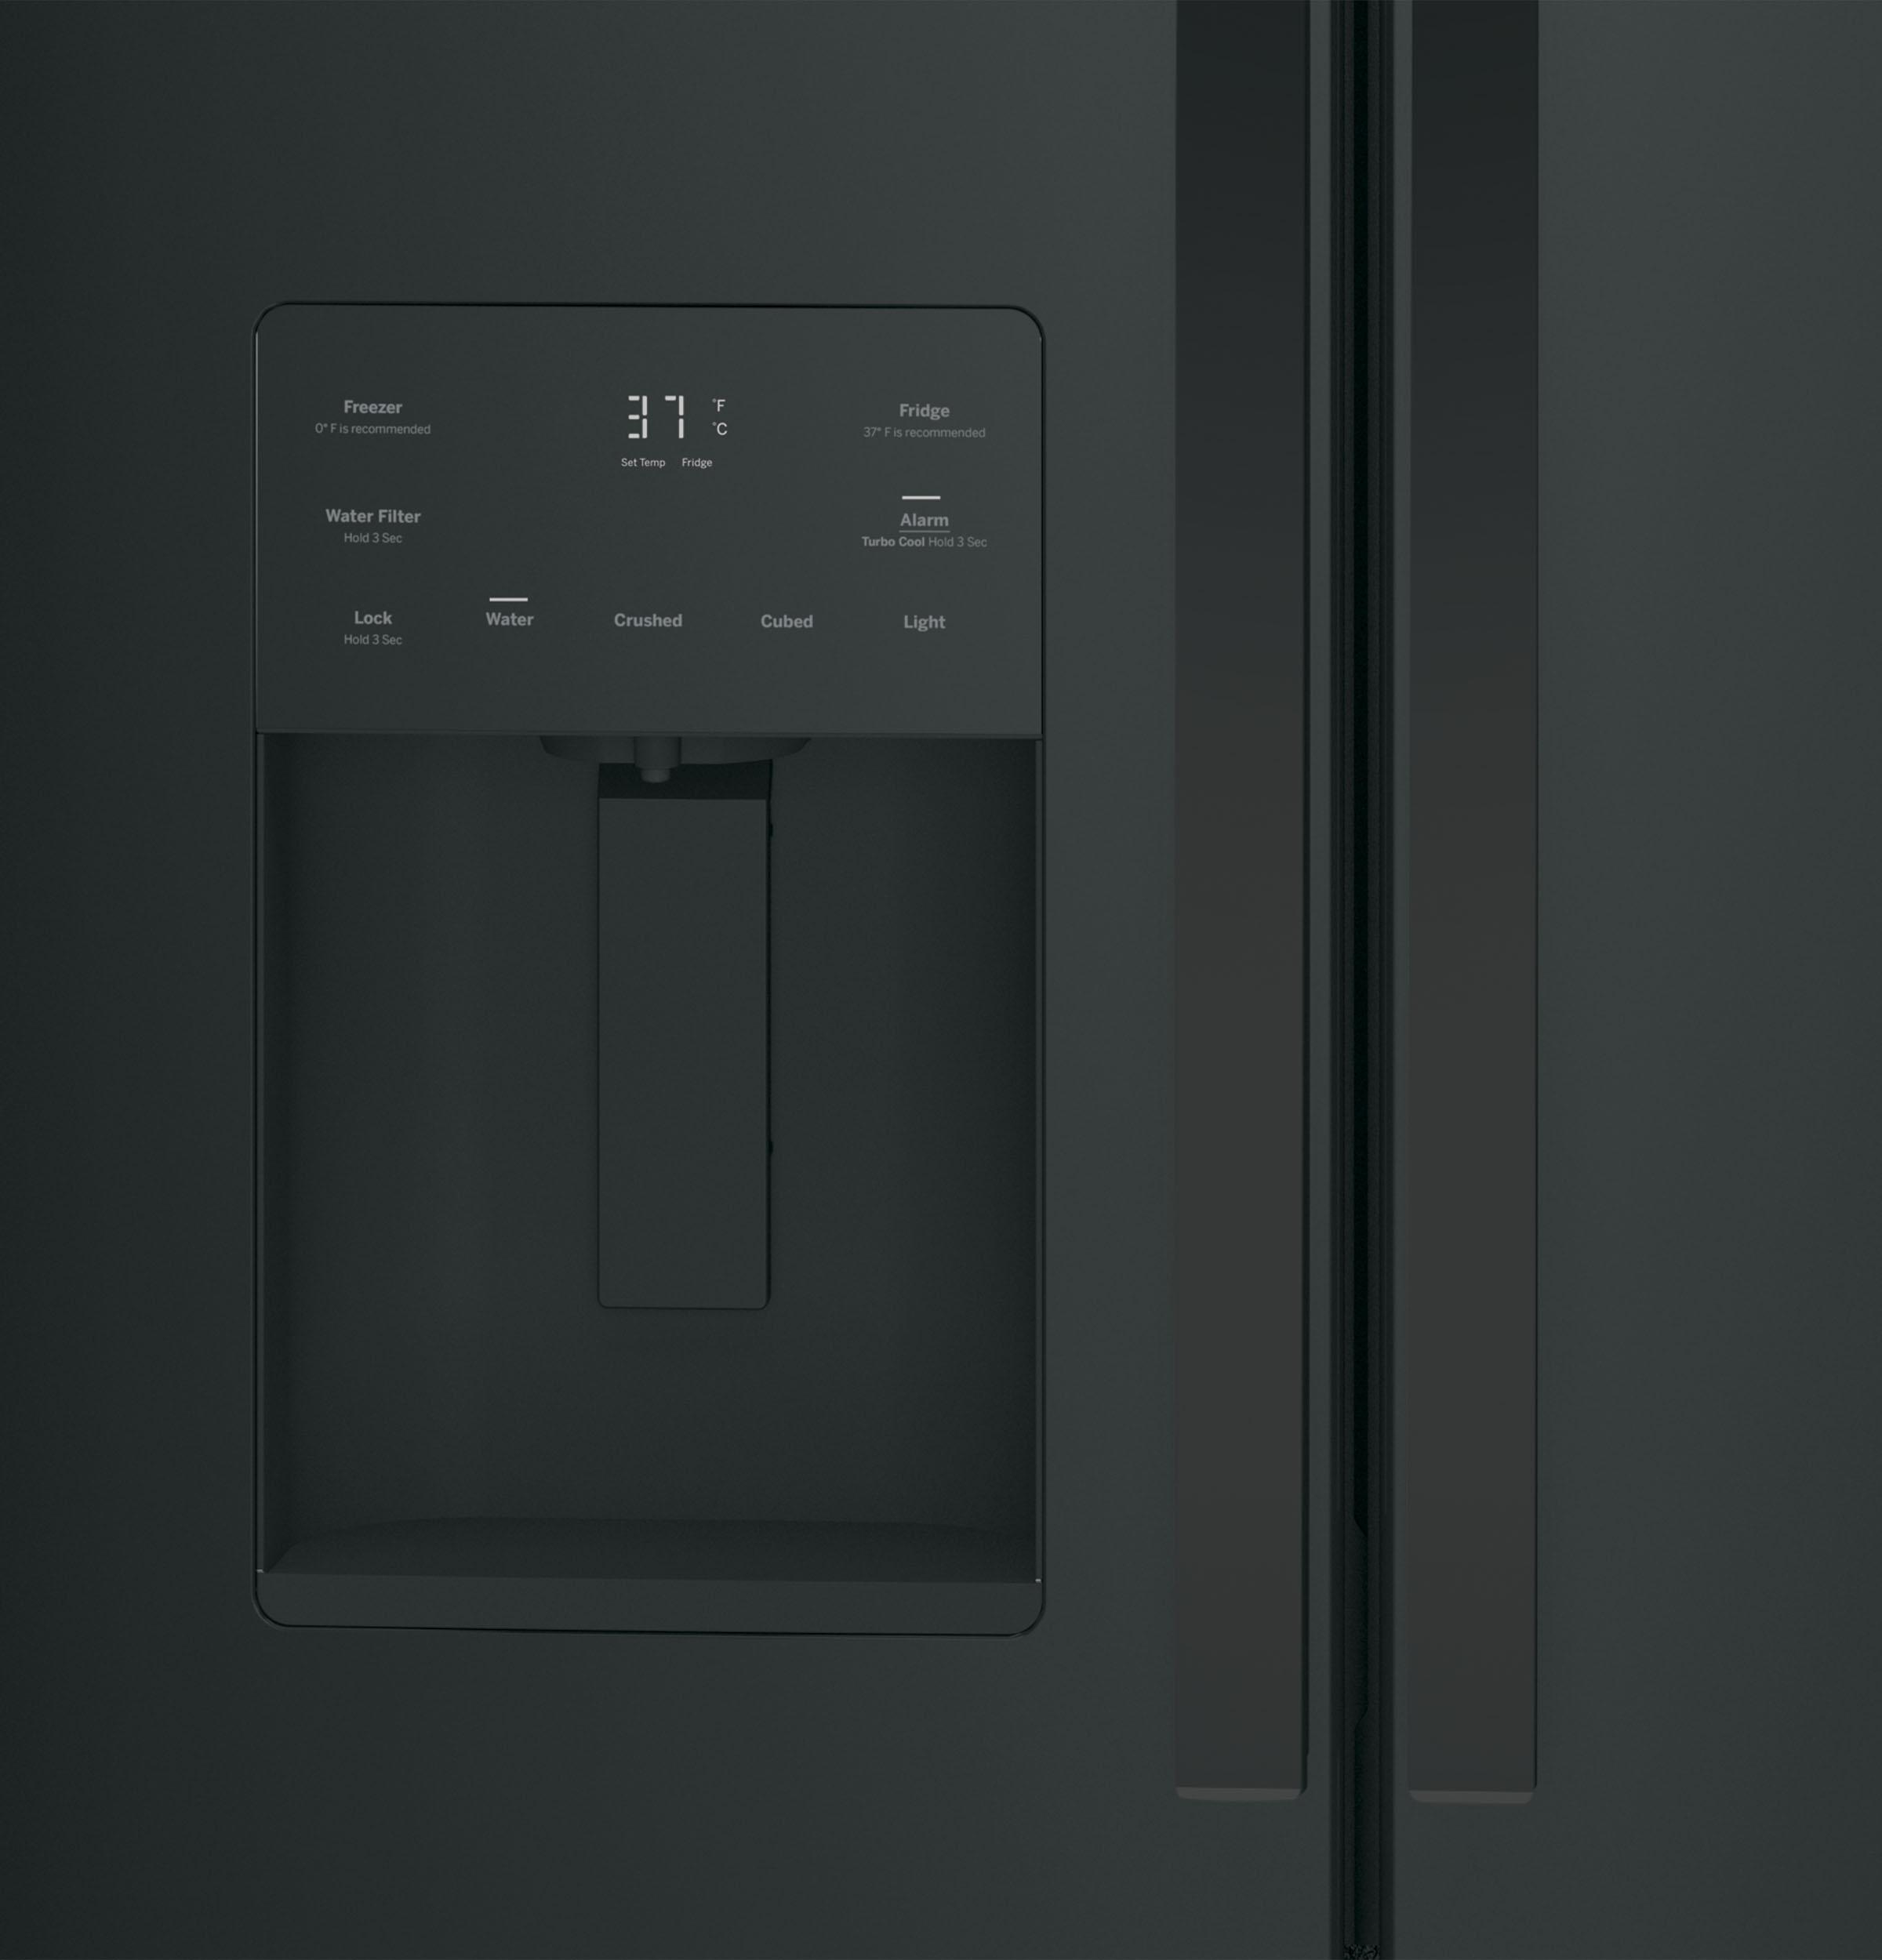 Model: GFE24JGKBB | GE GE® ENERGY STAR® 23.7 Cu. Ft. French-Door Refrigerator